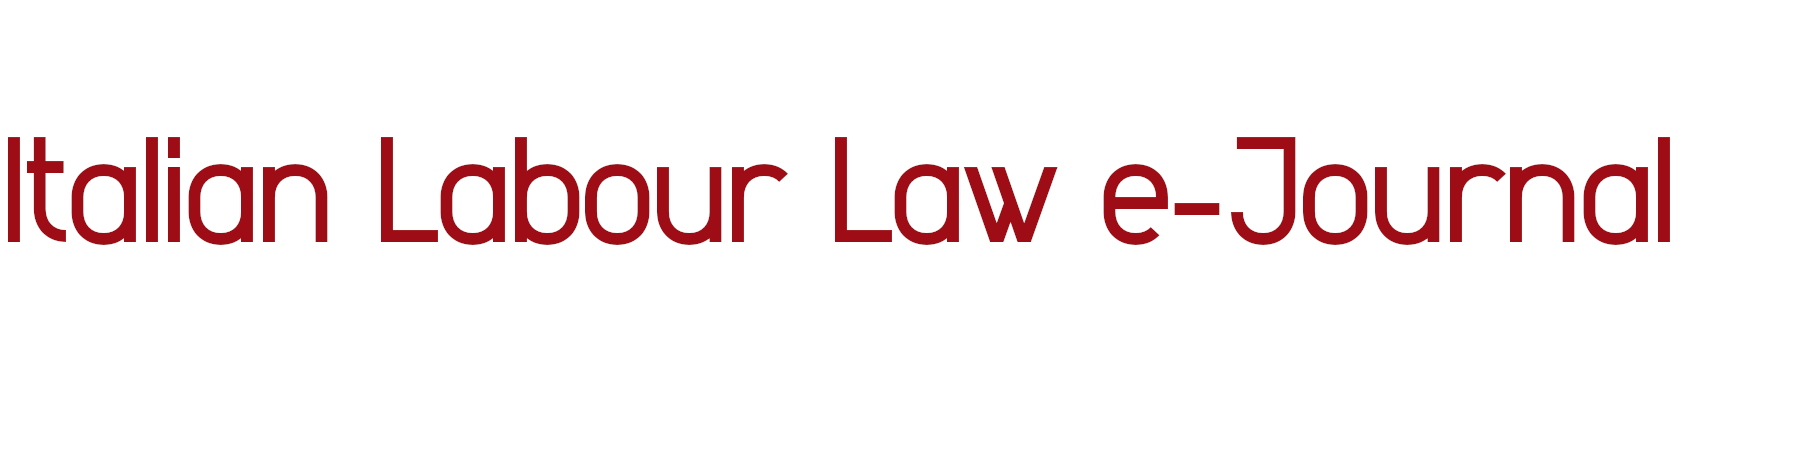 Italian Labour Law e-Journal